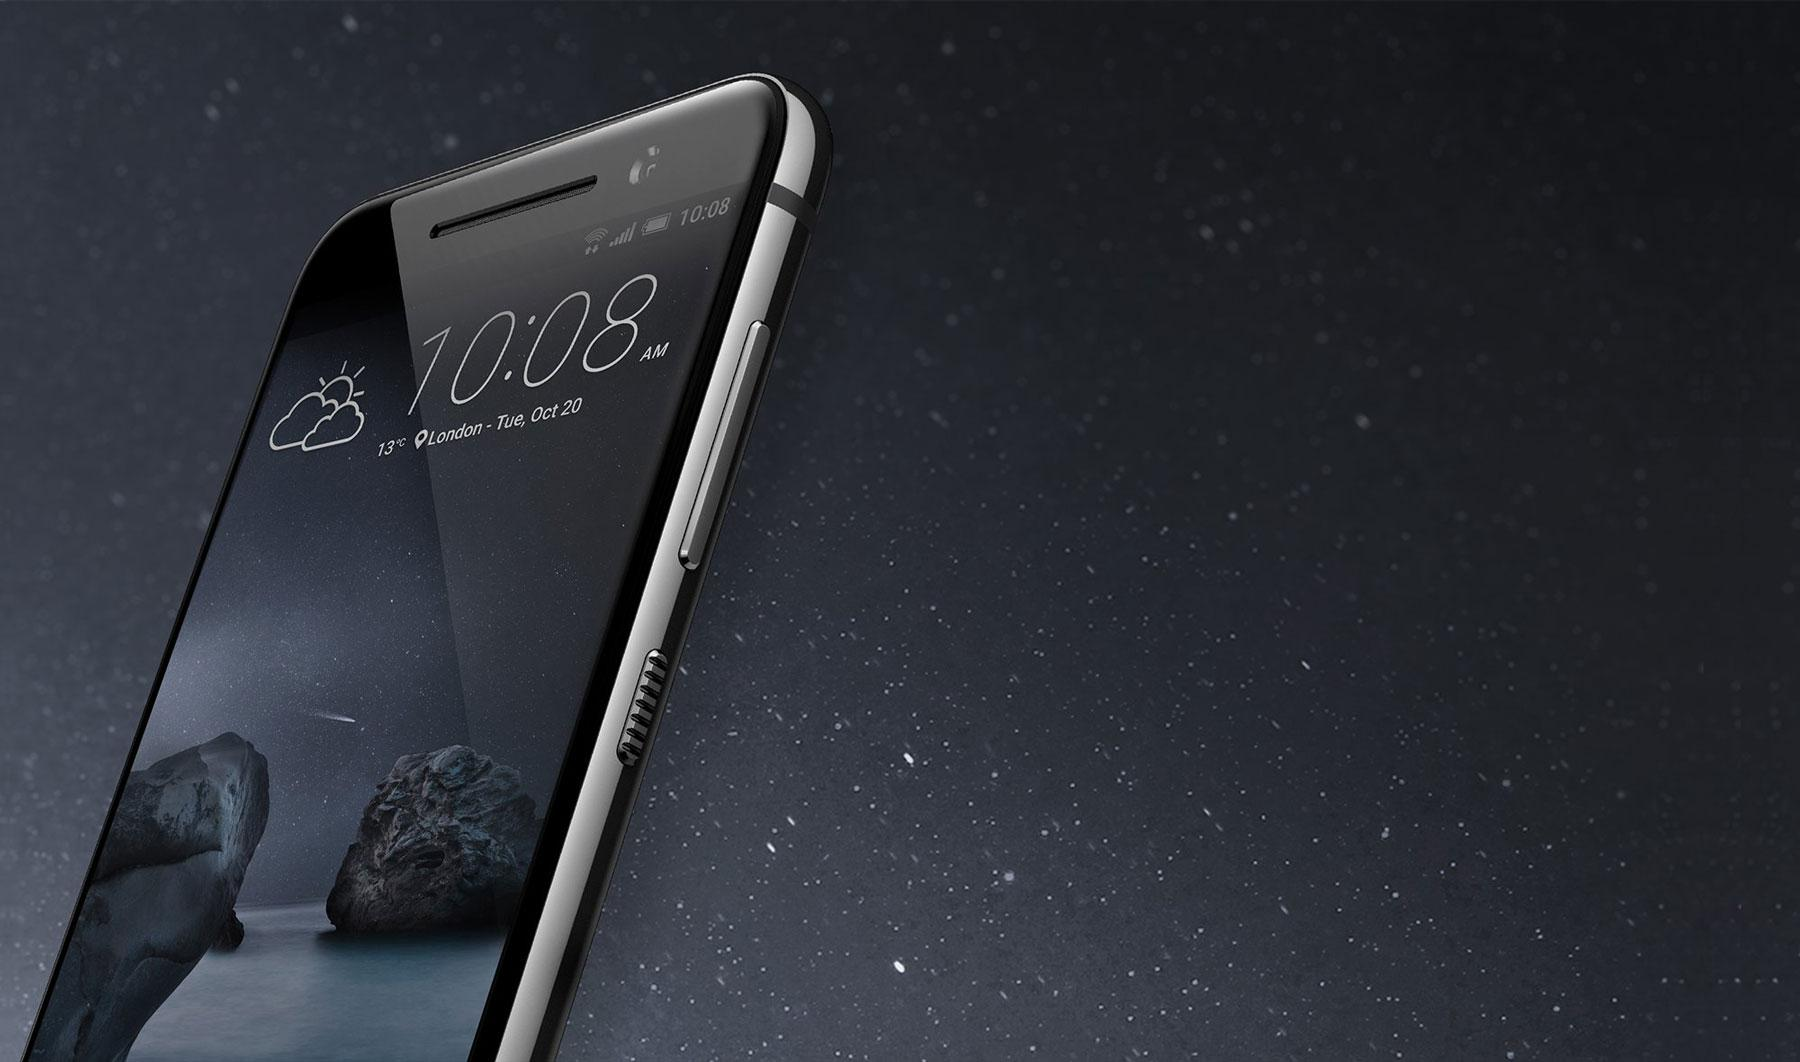 HTC One A9 detalle del perfil